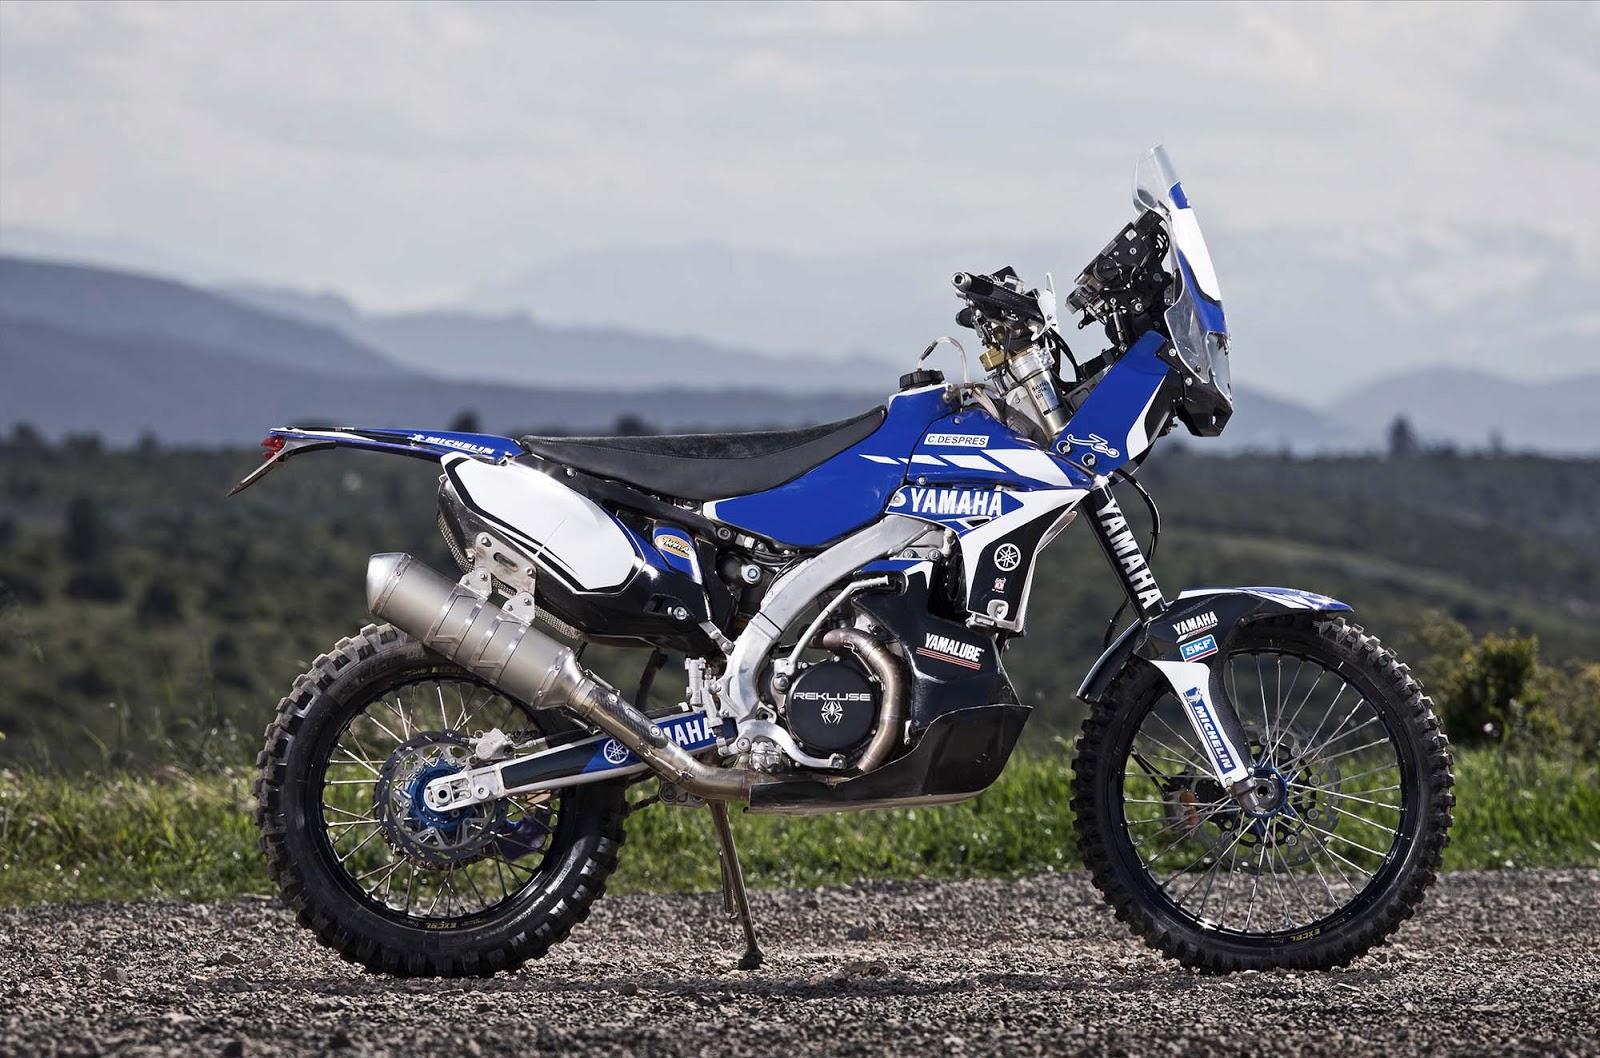 Cyril-Despres-Yamaha-Motor-France-2014-Dakar-Rally-09.jpg